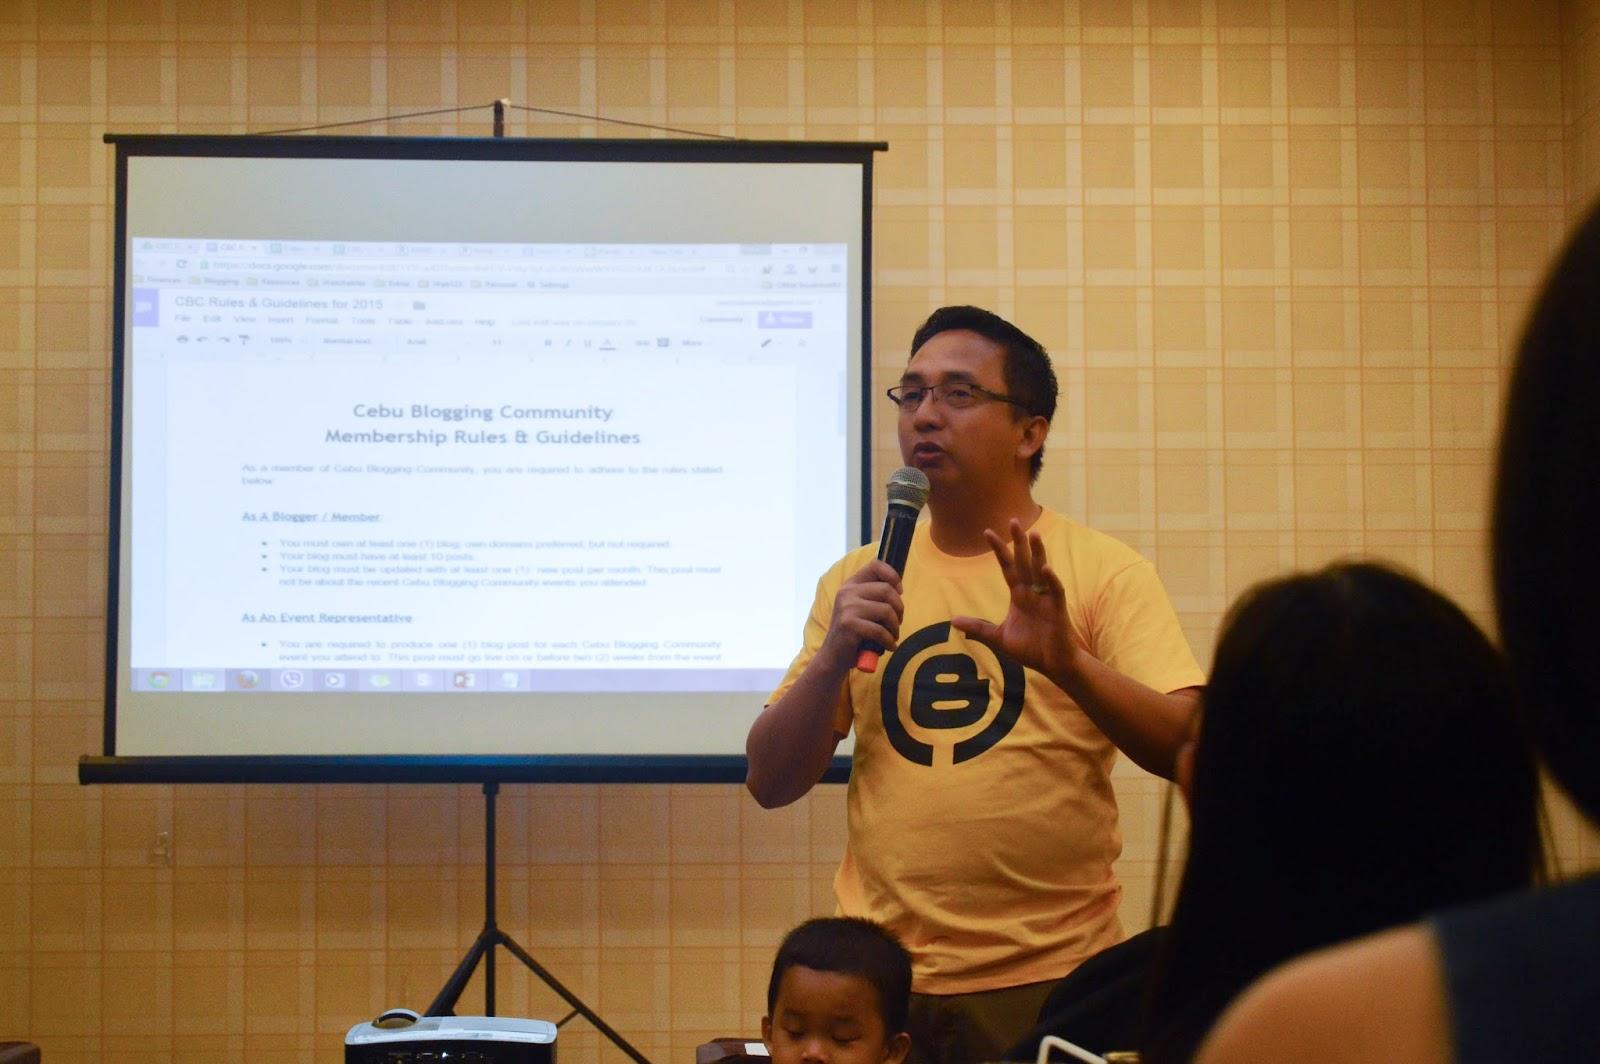 Cebu Blogging Community Ultimate Meet-up